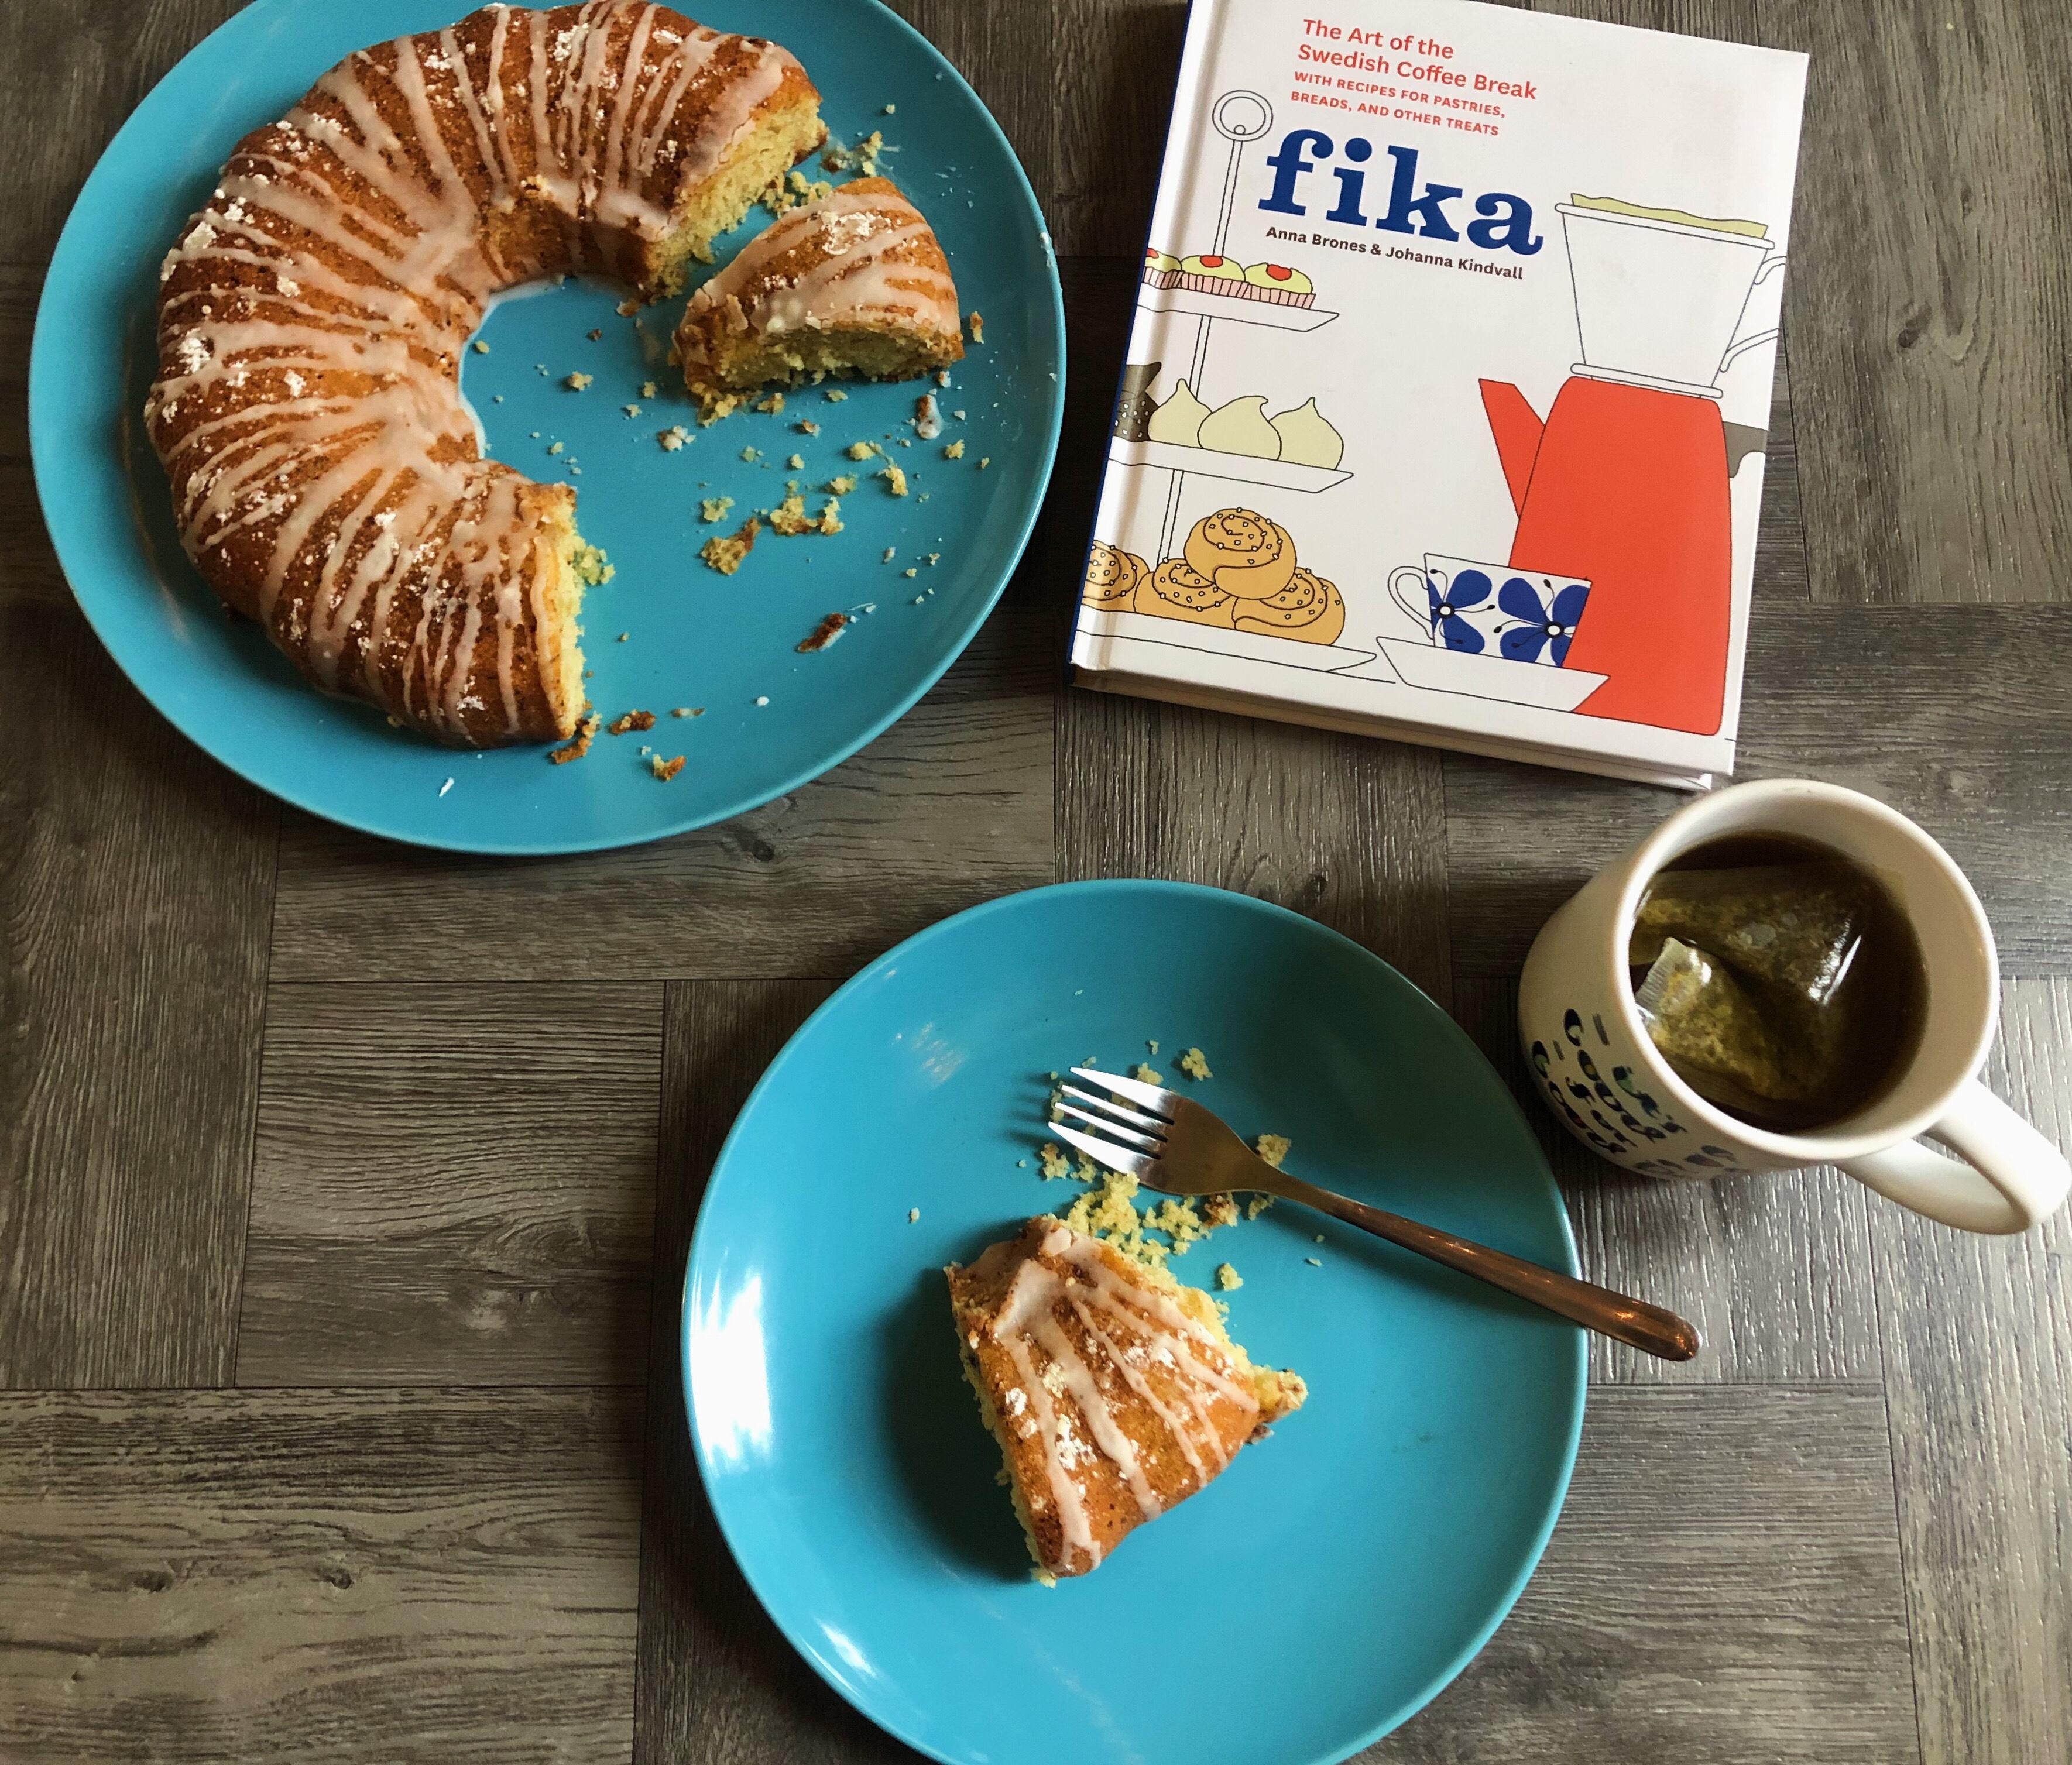 Kardemummakaka (Cardamom Bundt Cake)